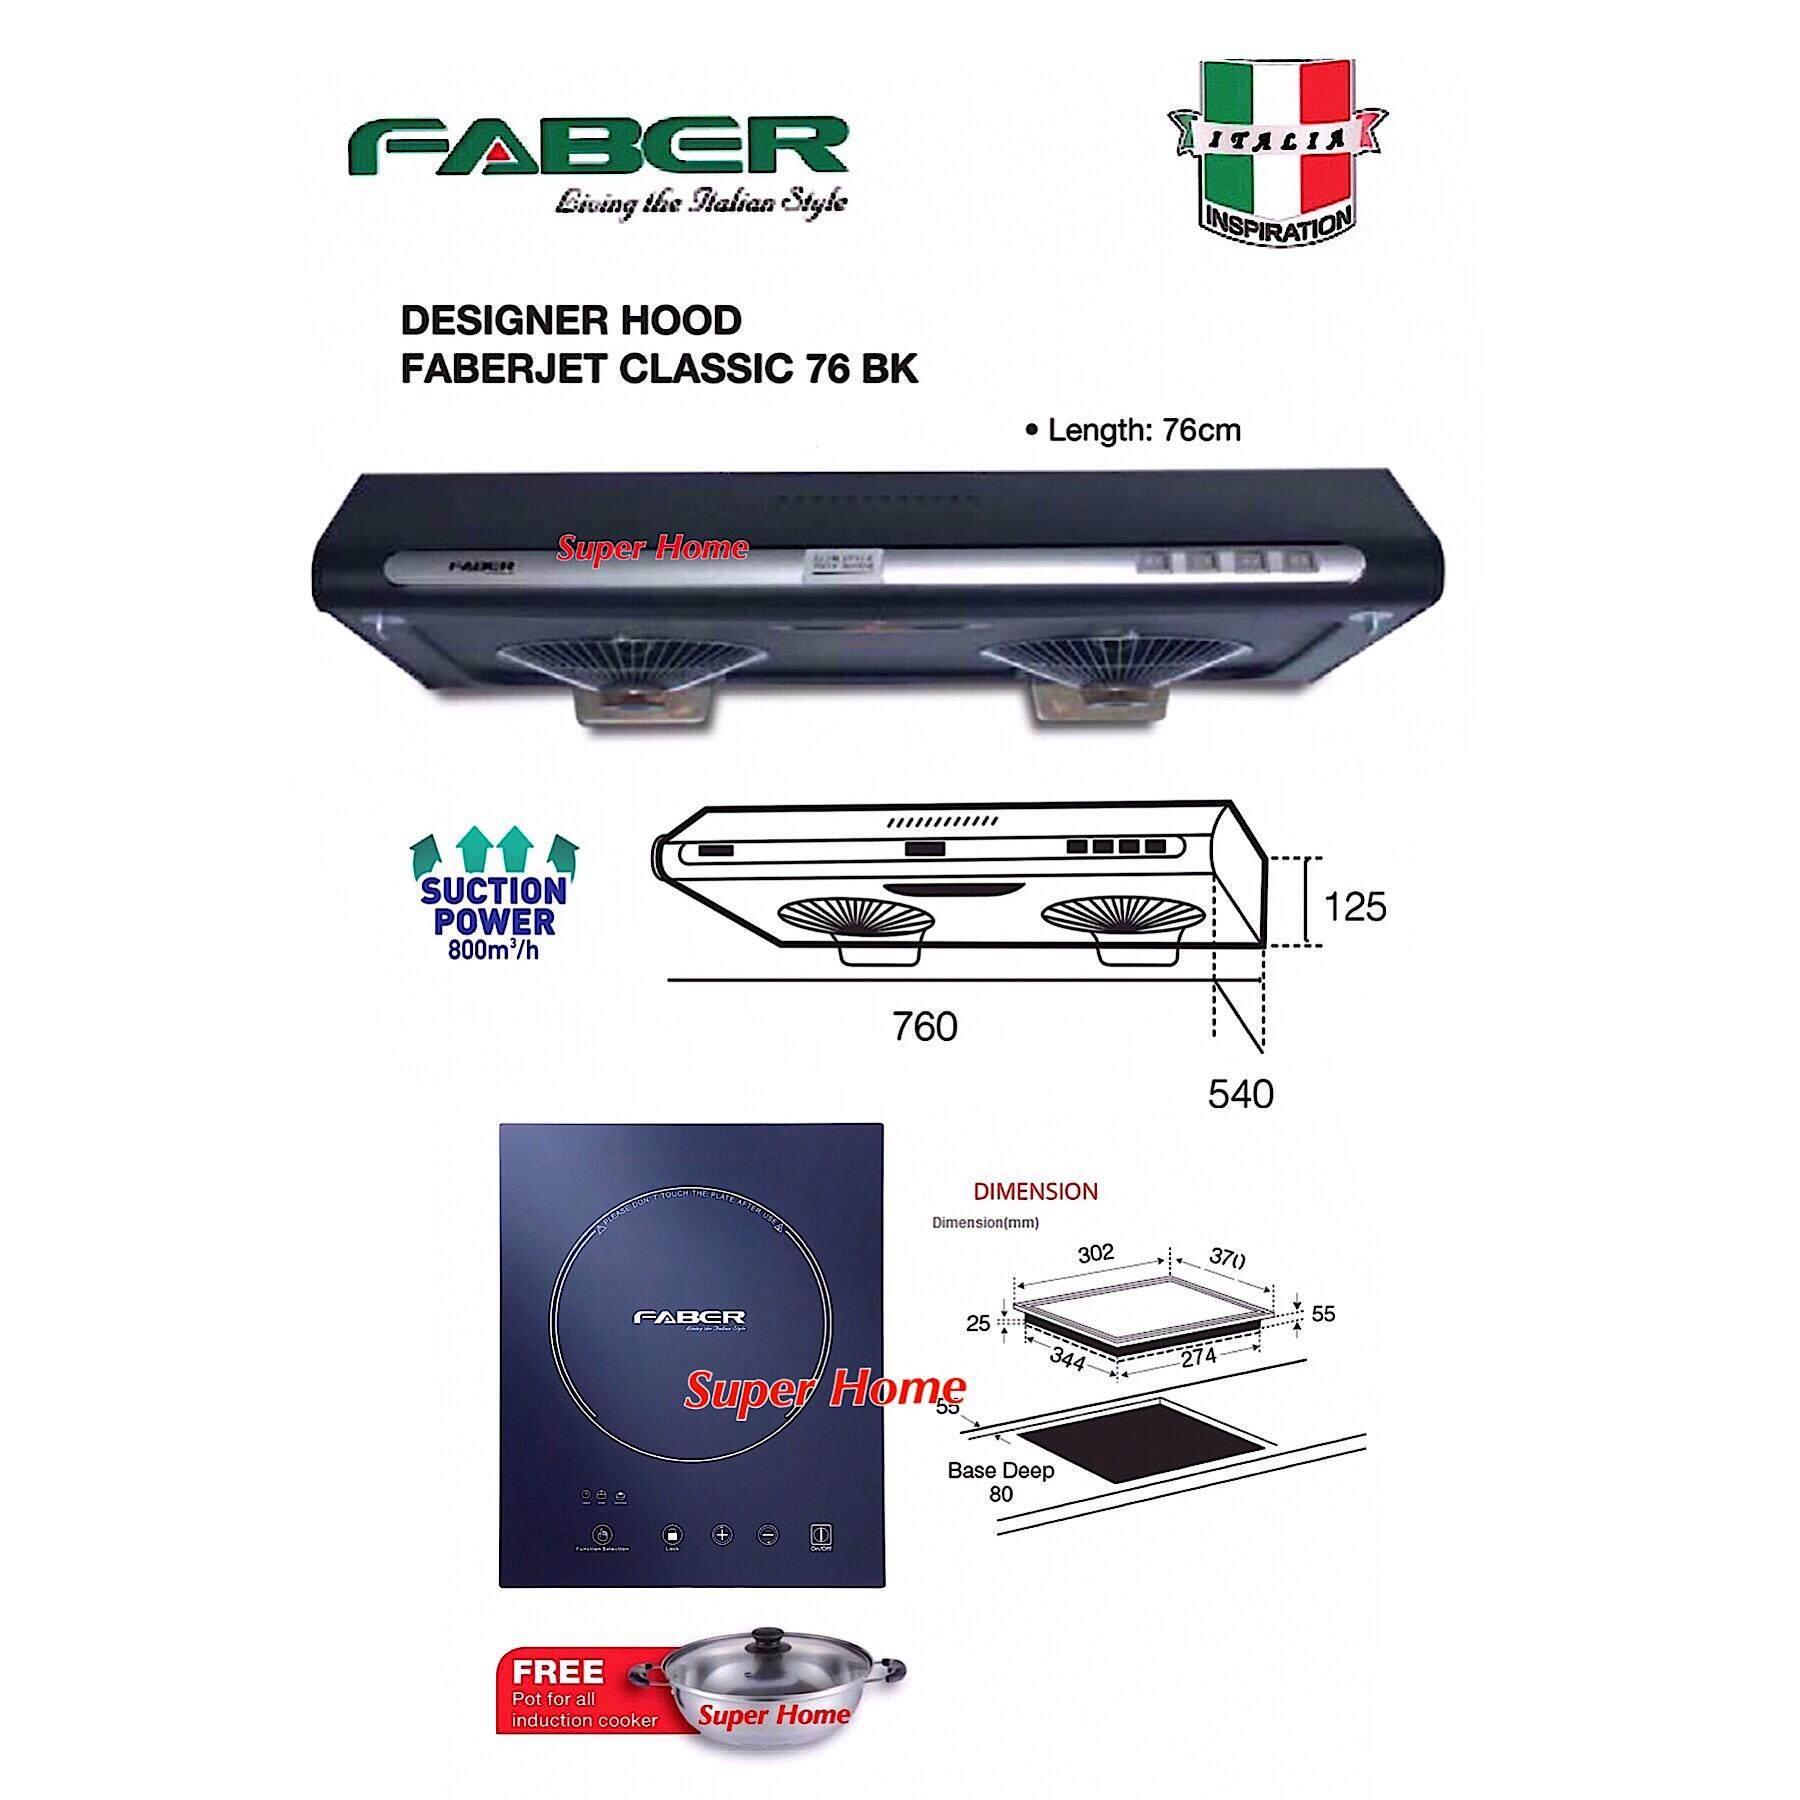 Faber Slim Hood FABERJET CLASSIC76BK Slim Cooker Hood 2 5Feet(76CM) + Faber  FIC 2020 S Built-in Induction Cooker